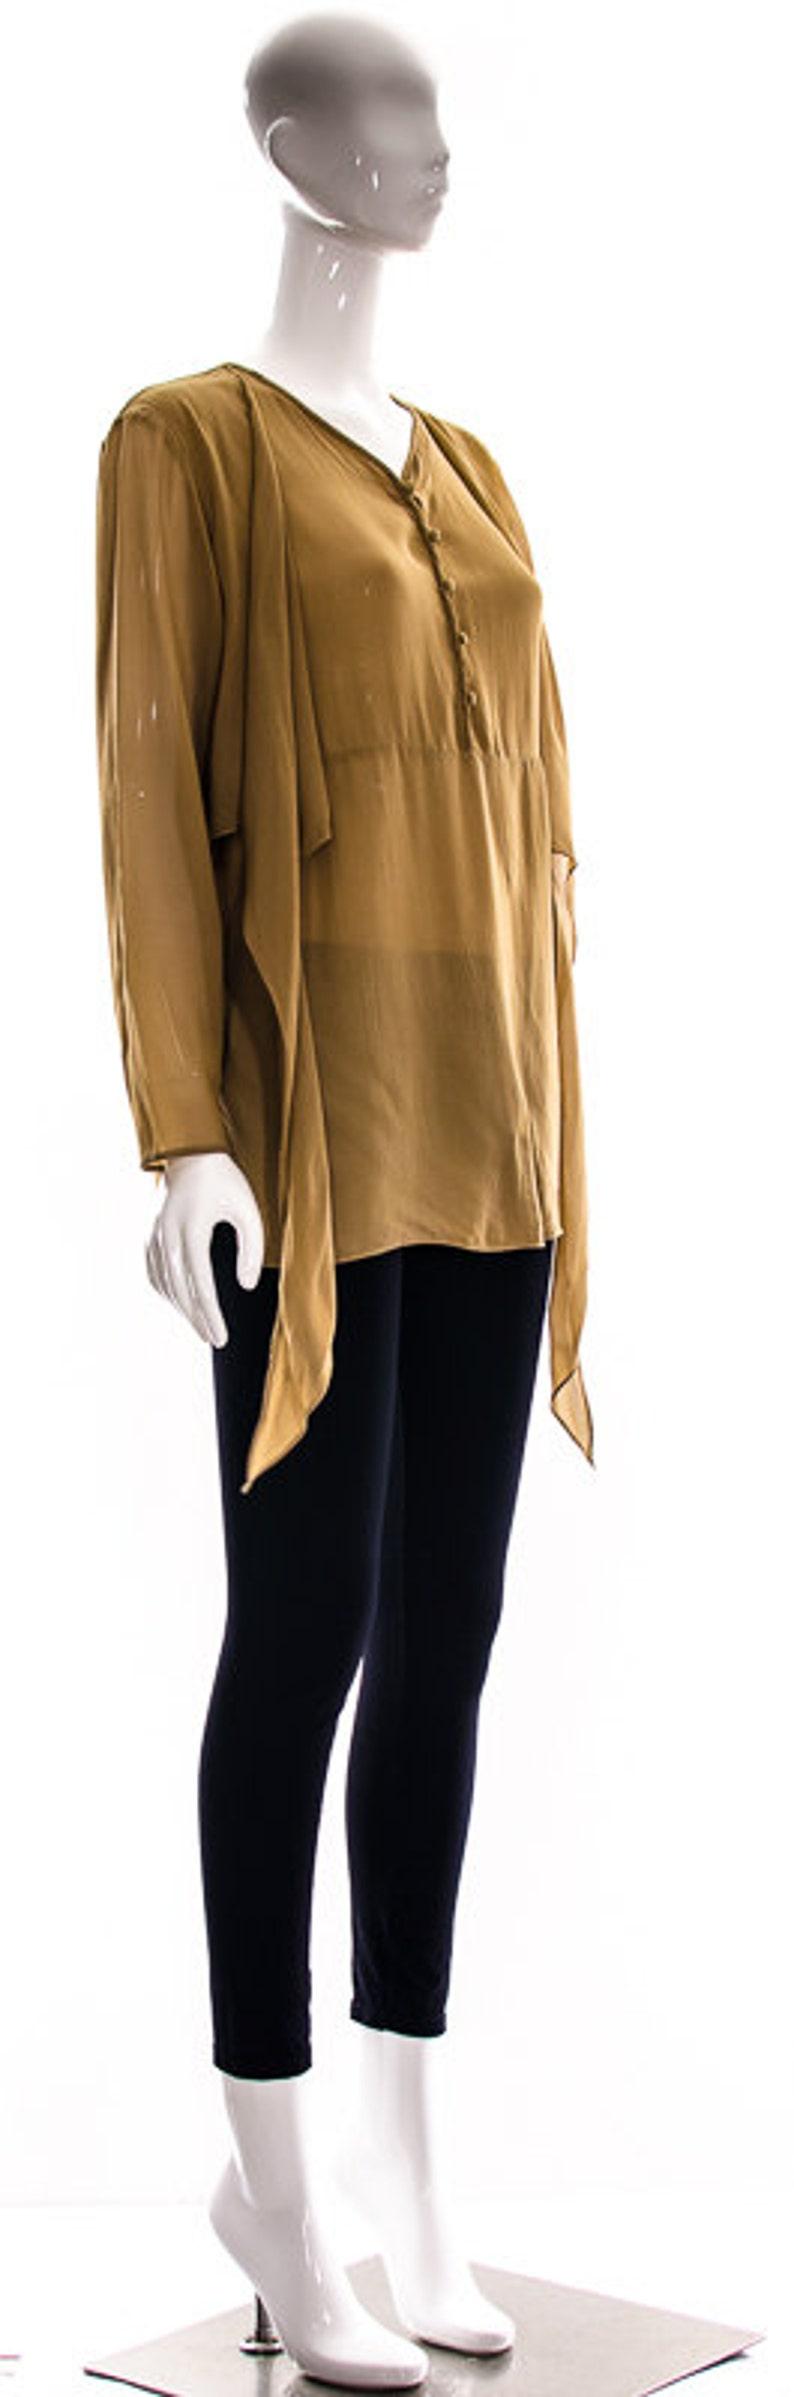 Vintage Coffee and Cream Latte Brown SILK Blouse Diaphanous Silk Panels Attached Silk Scarves Avant Garde Medium